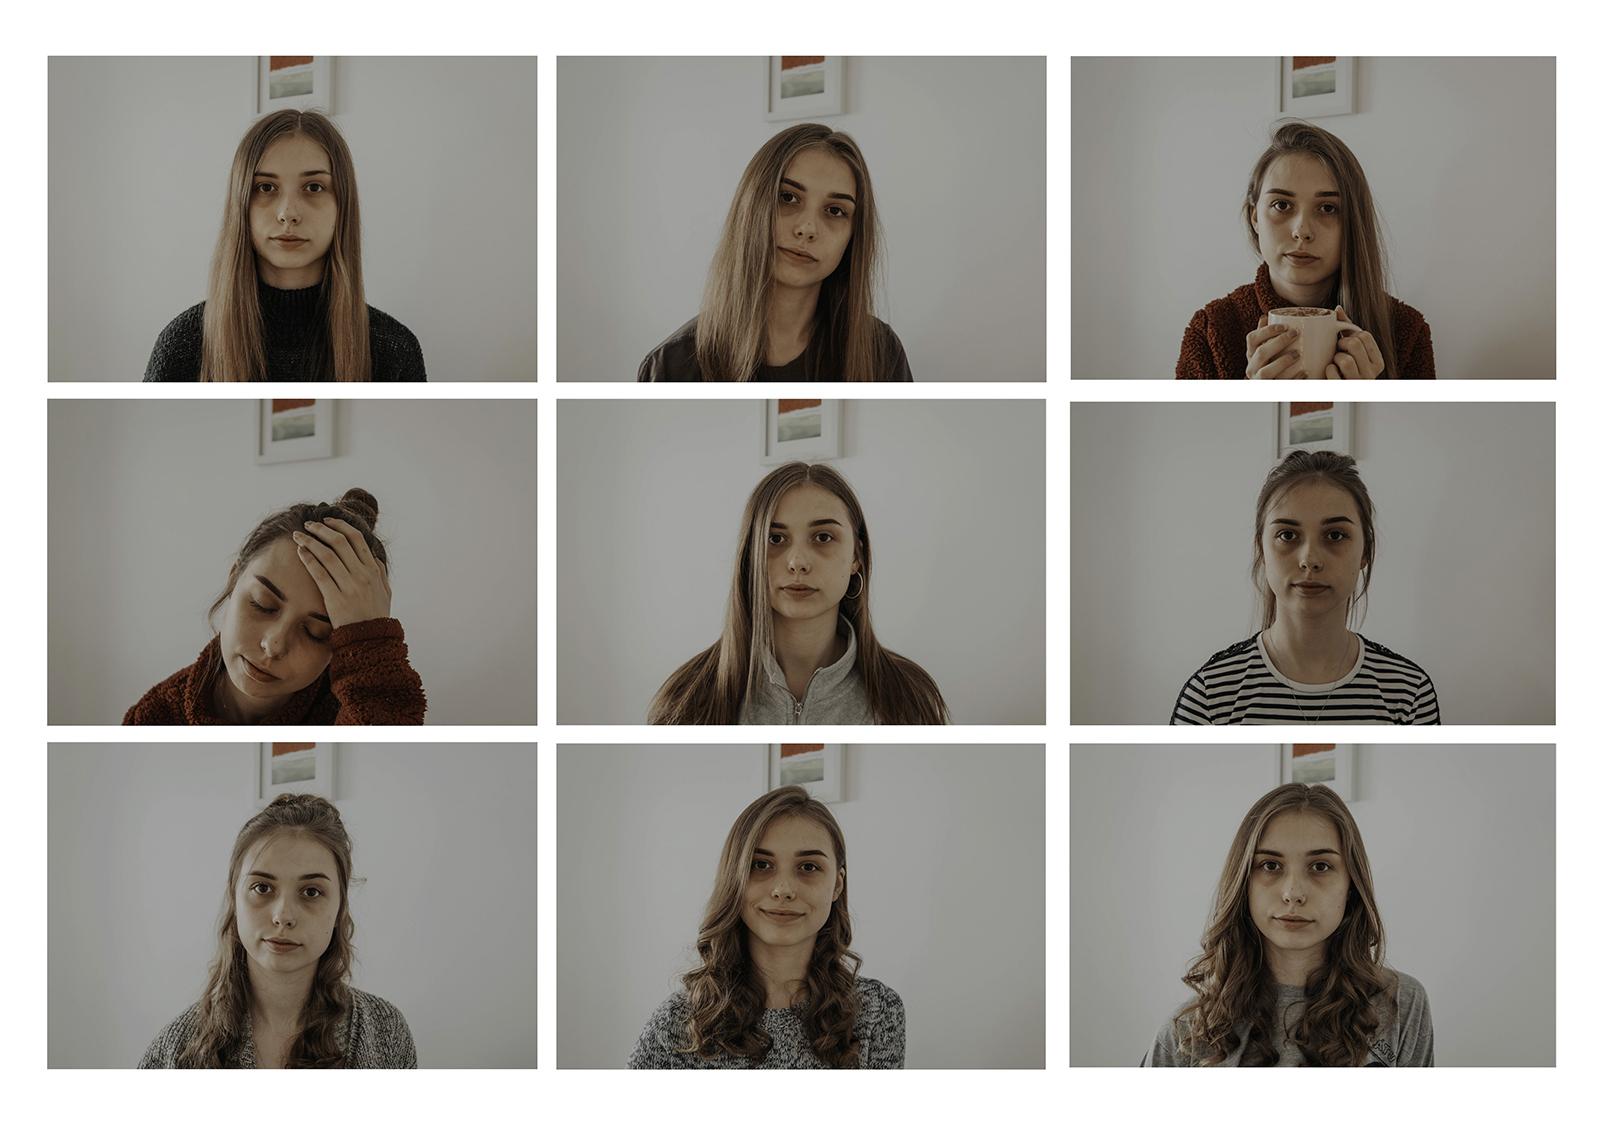 Lauren Fautley - 9 Days in Self-Isolation